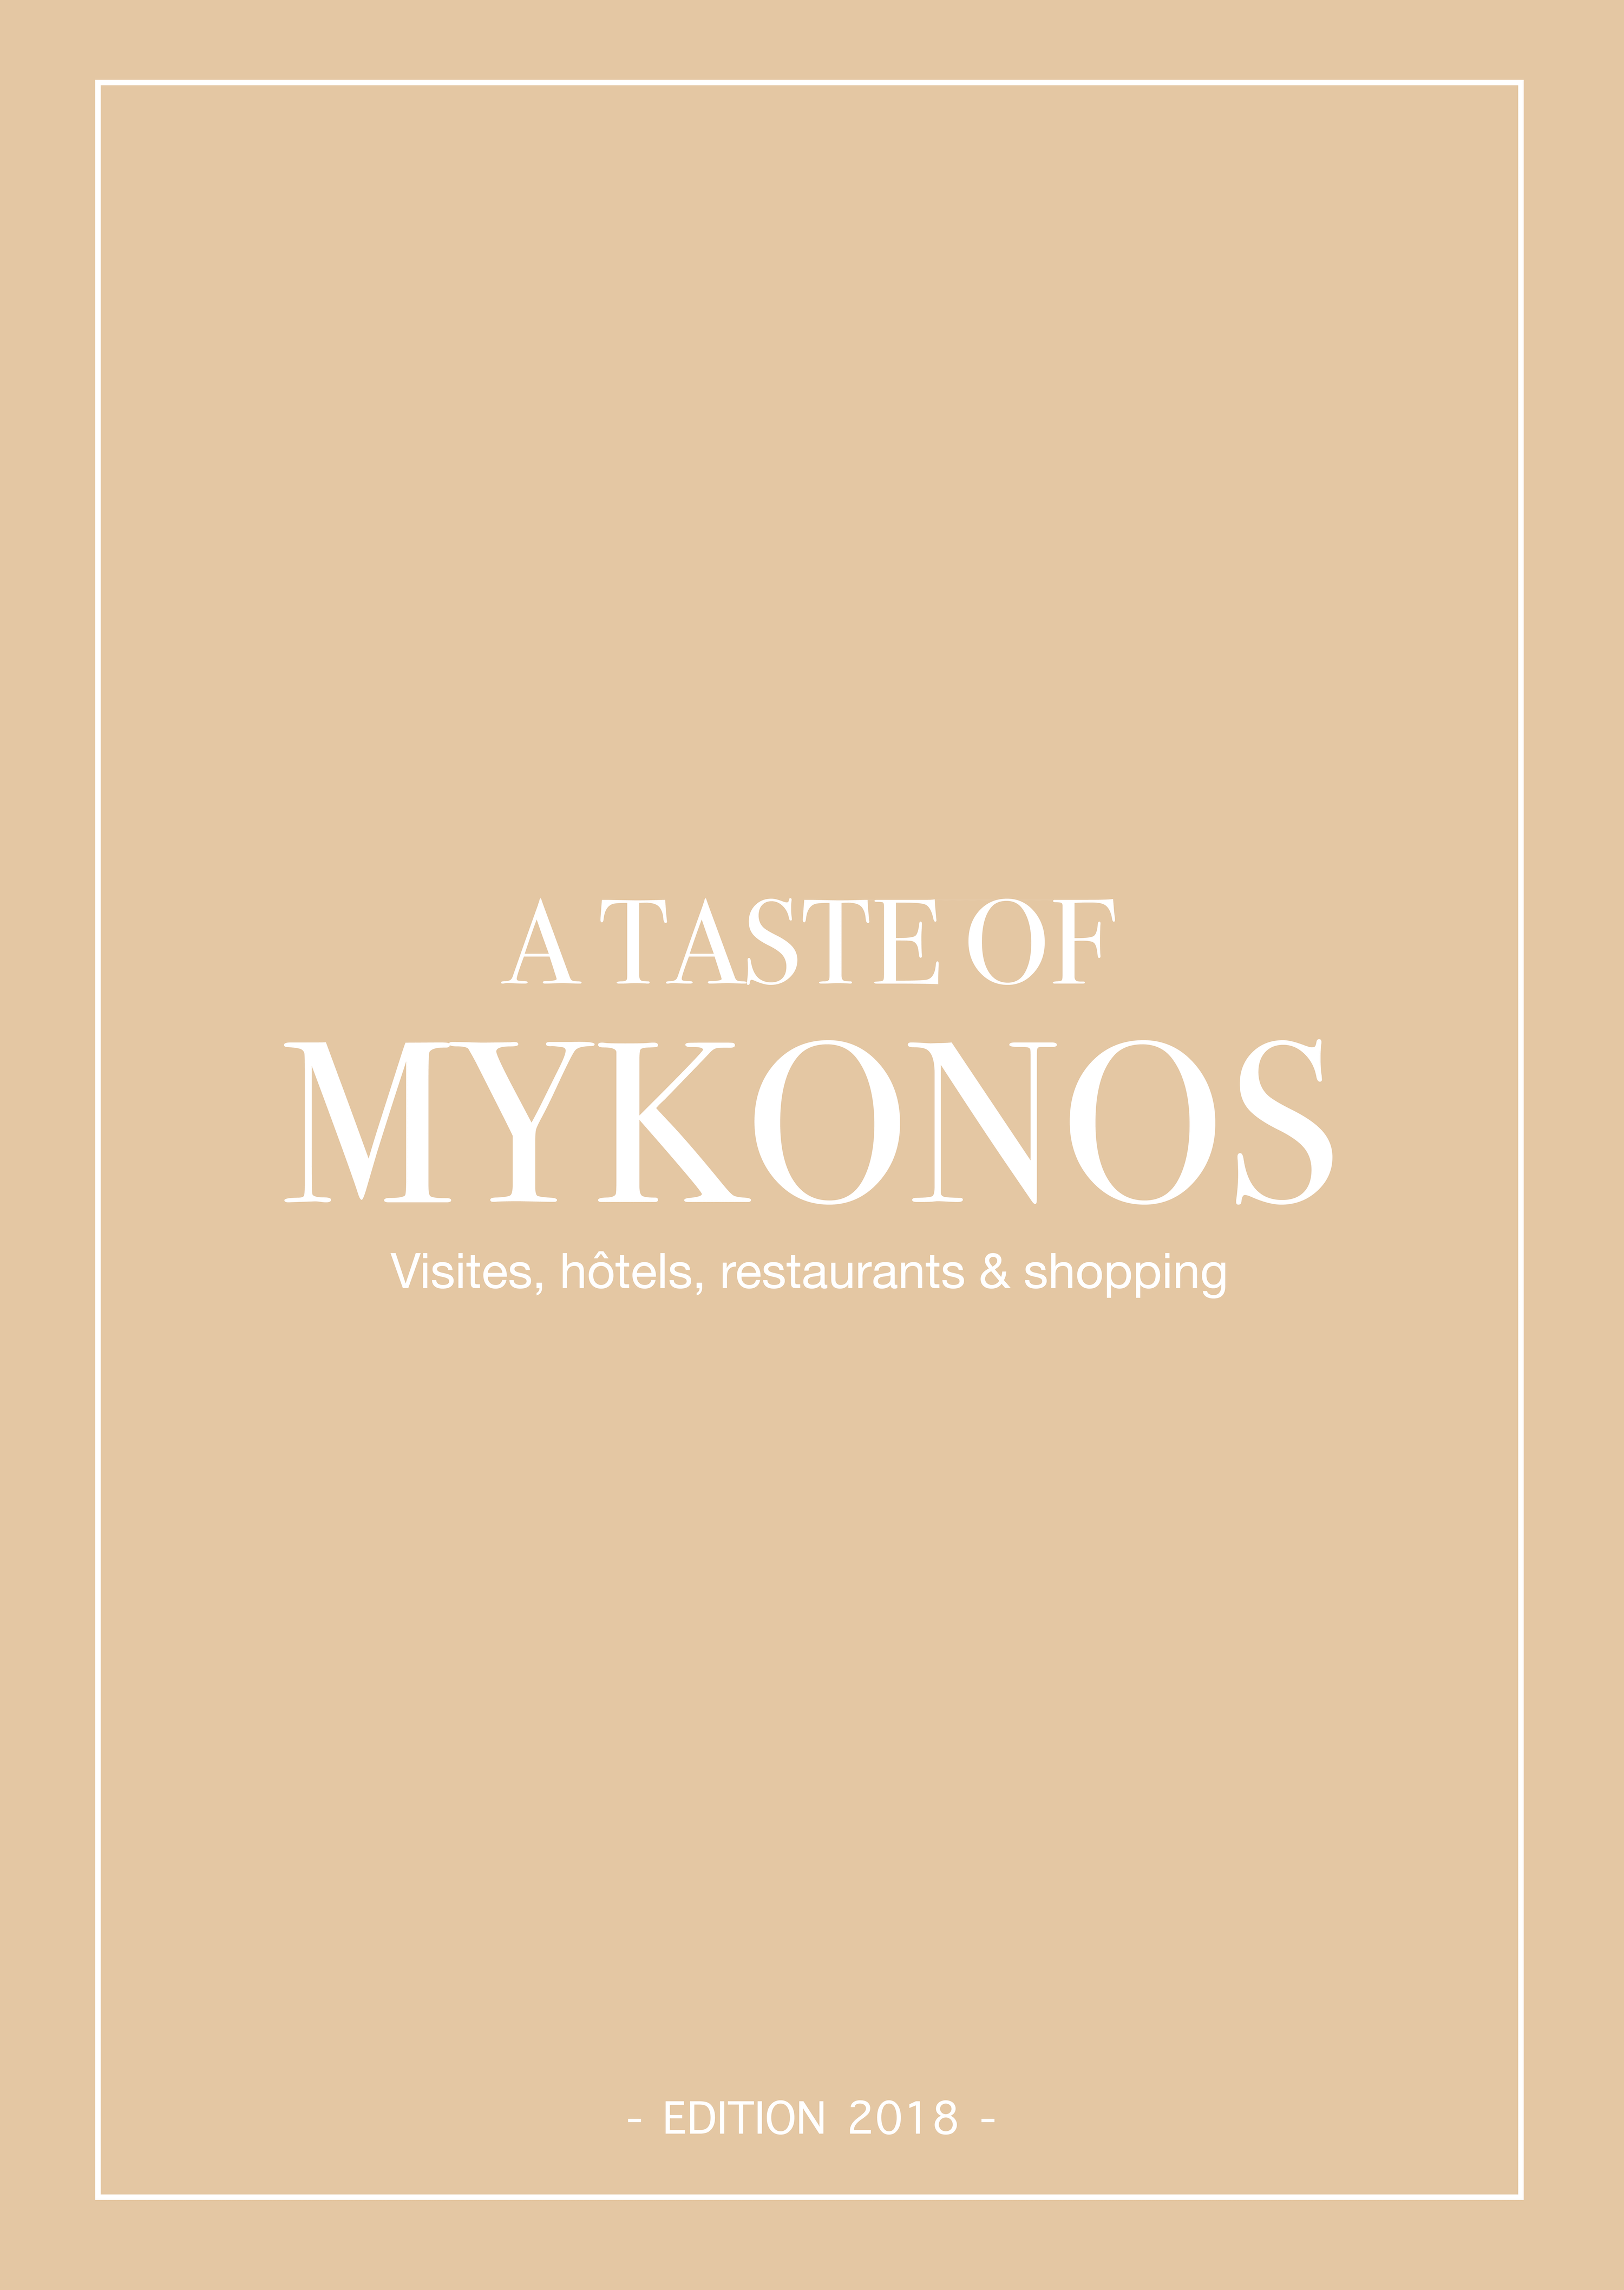 A taste of Mykonos - Bonnes adresses à Mykonos